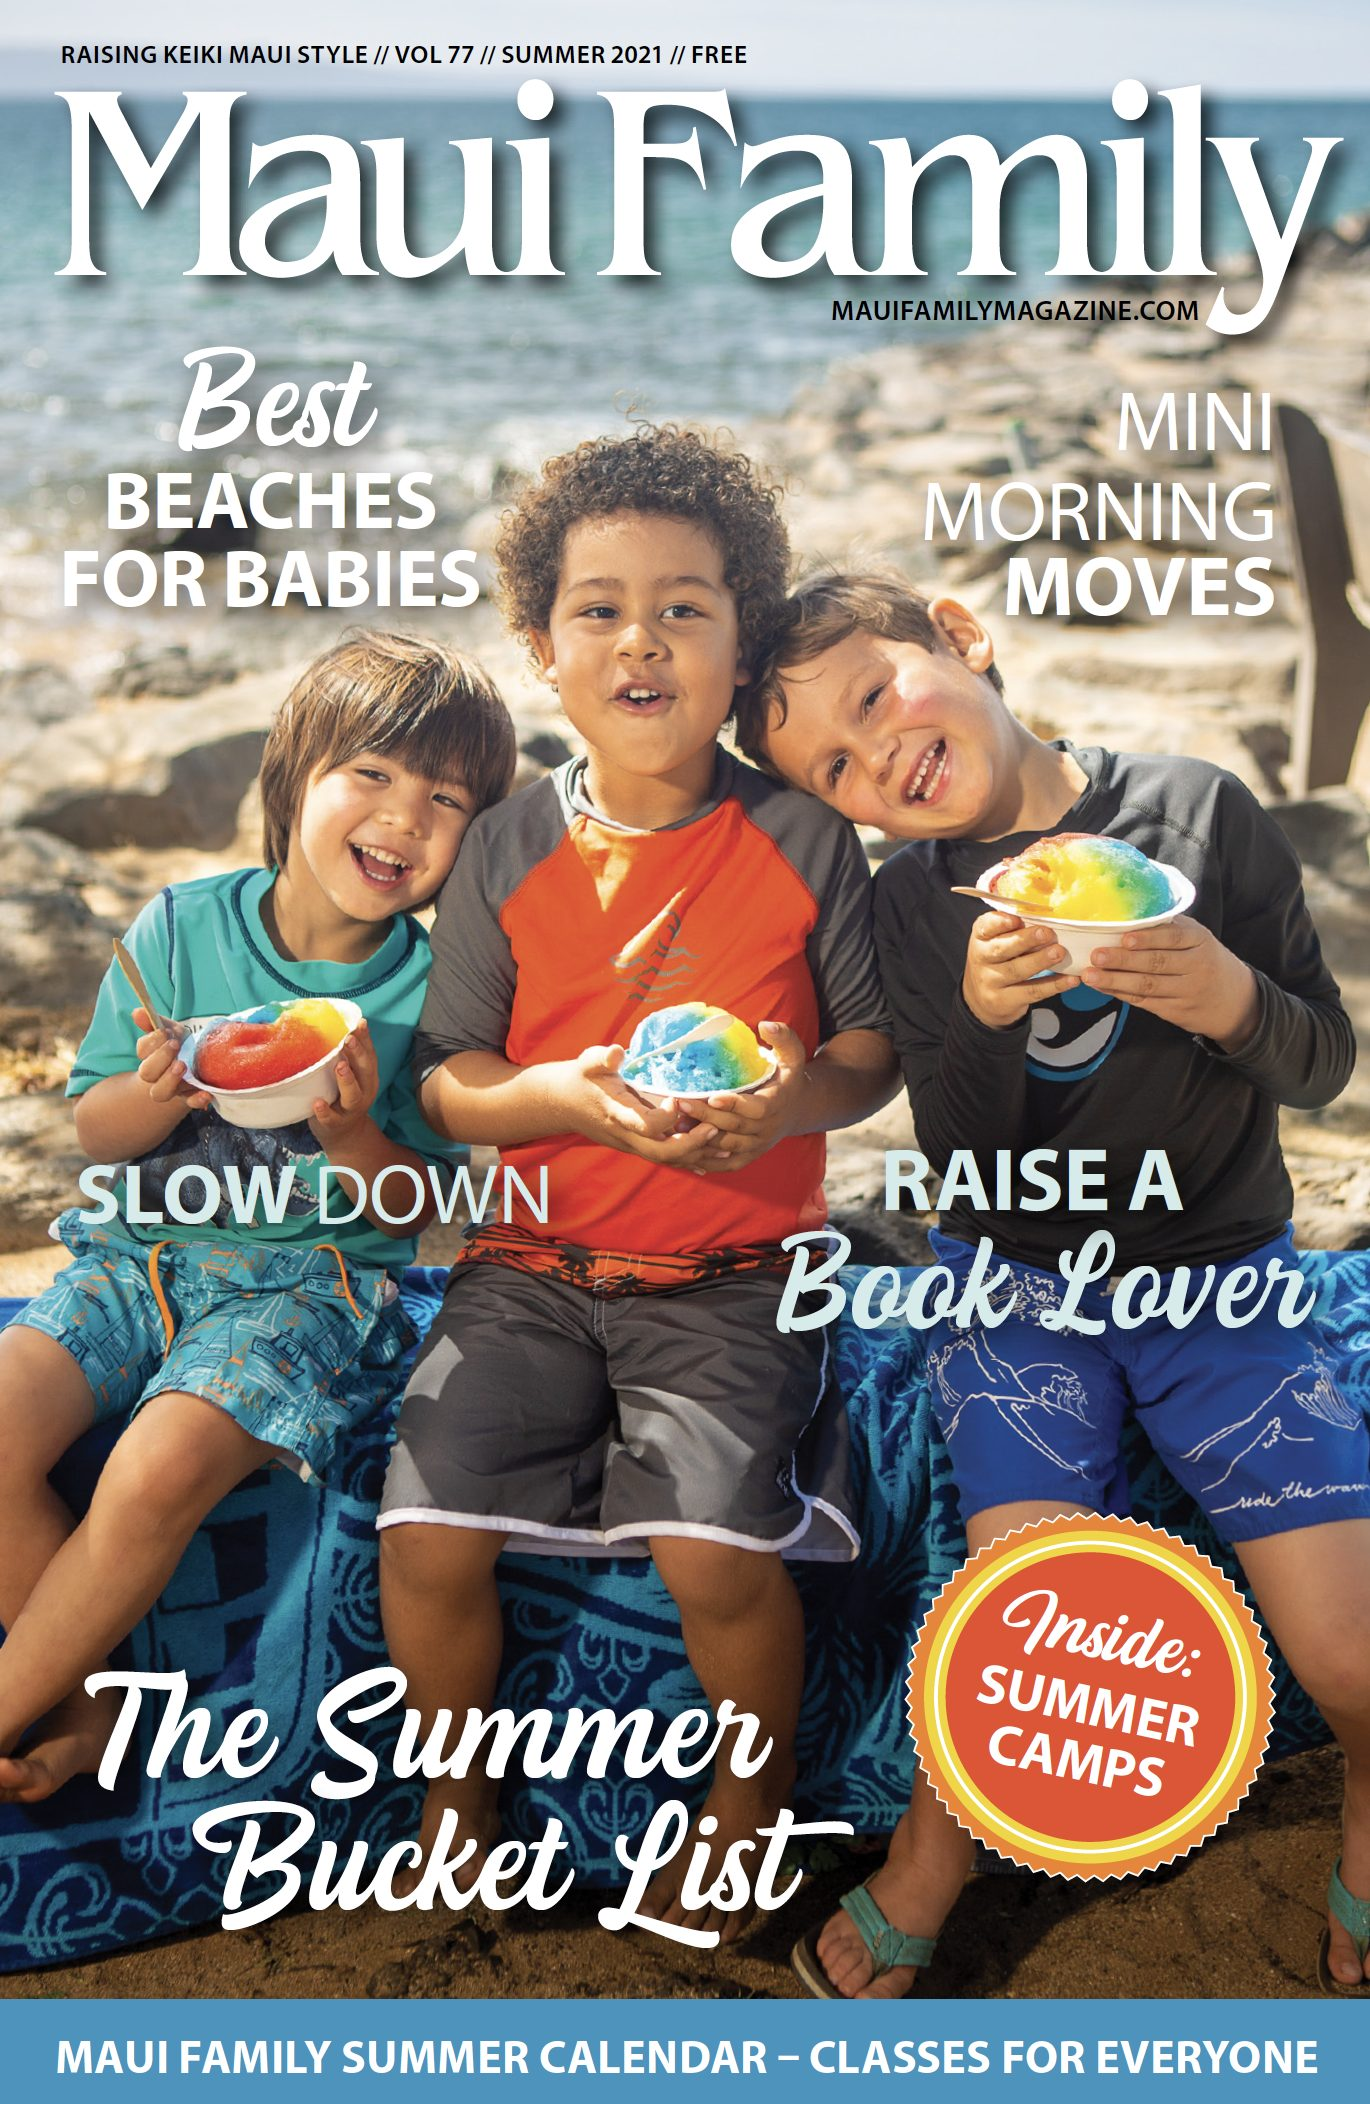 Maui Family Magazine Summer 2021